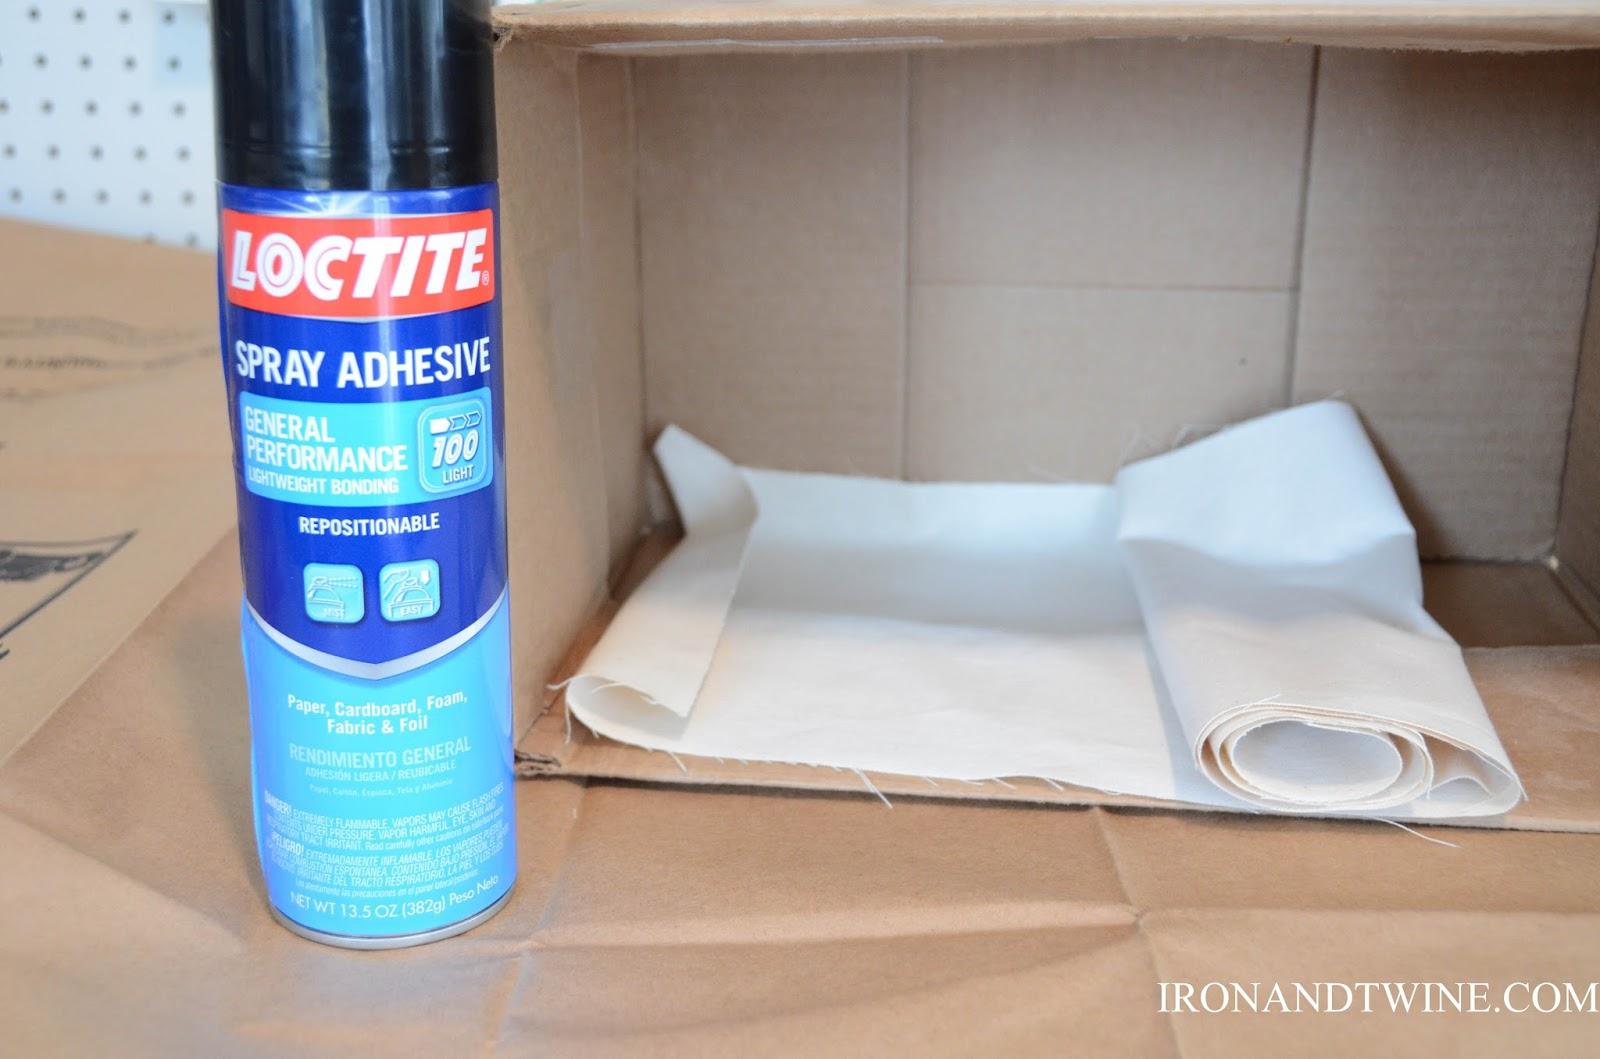 DIY+Belt+Handled+Box,+DIY+fabric+covered+box,+Iron+and+Twine+(18).jpg